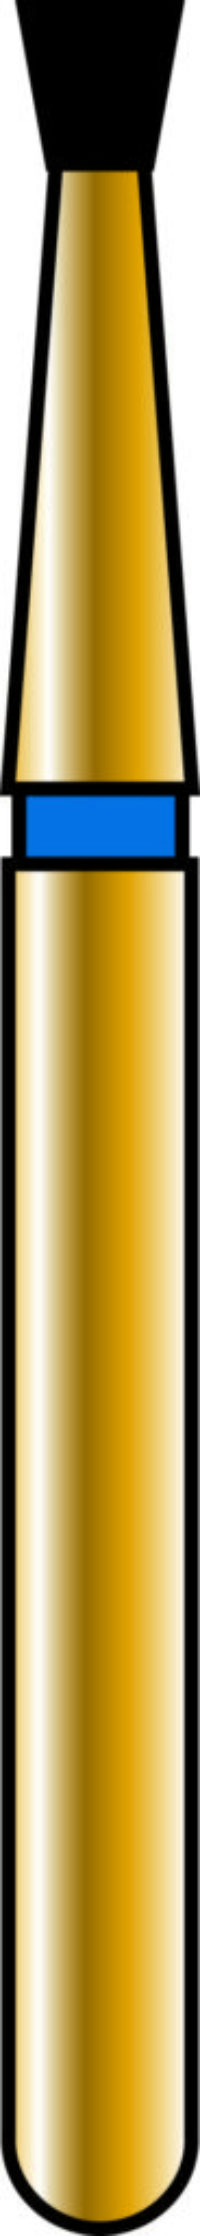 Inverted Cone 14-1.4mm Gold Diamond Bur - Coarse Grit